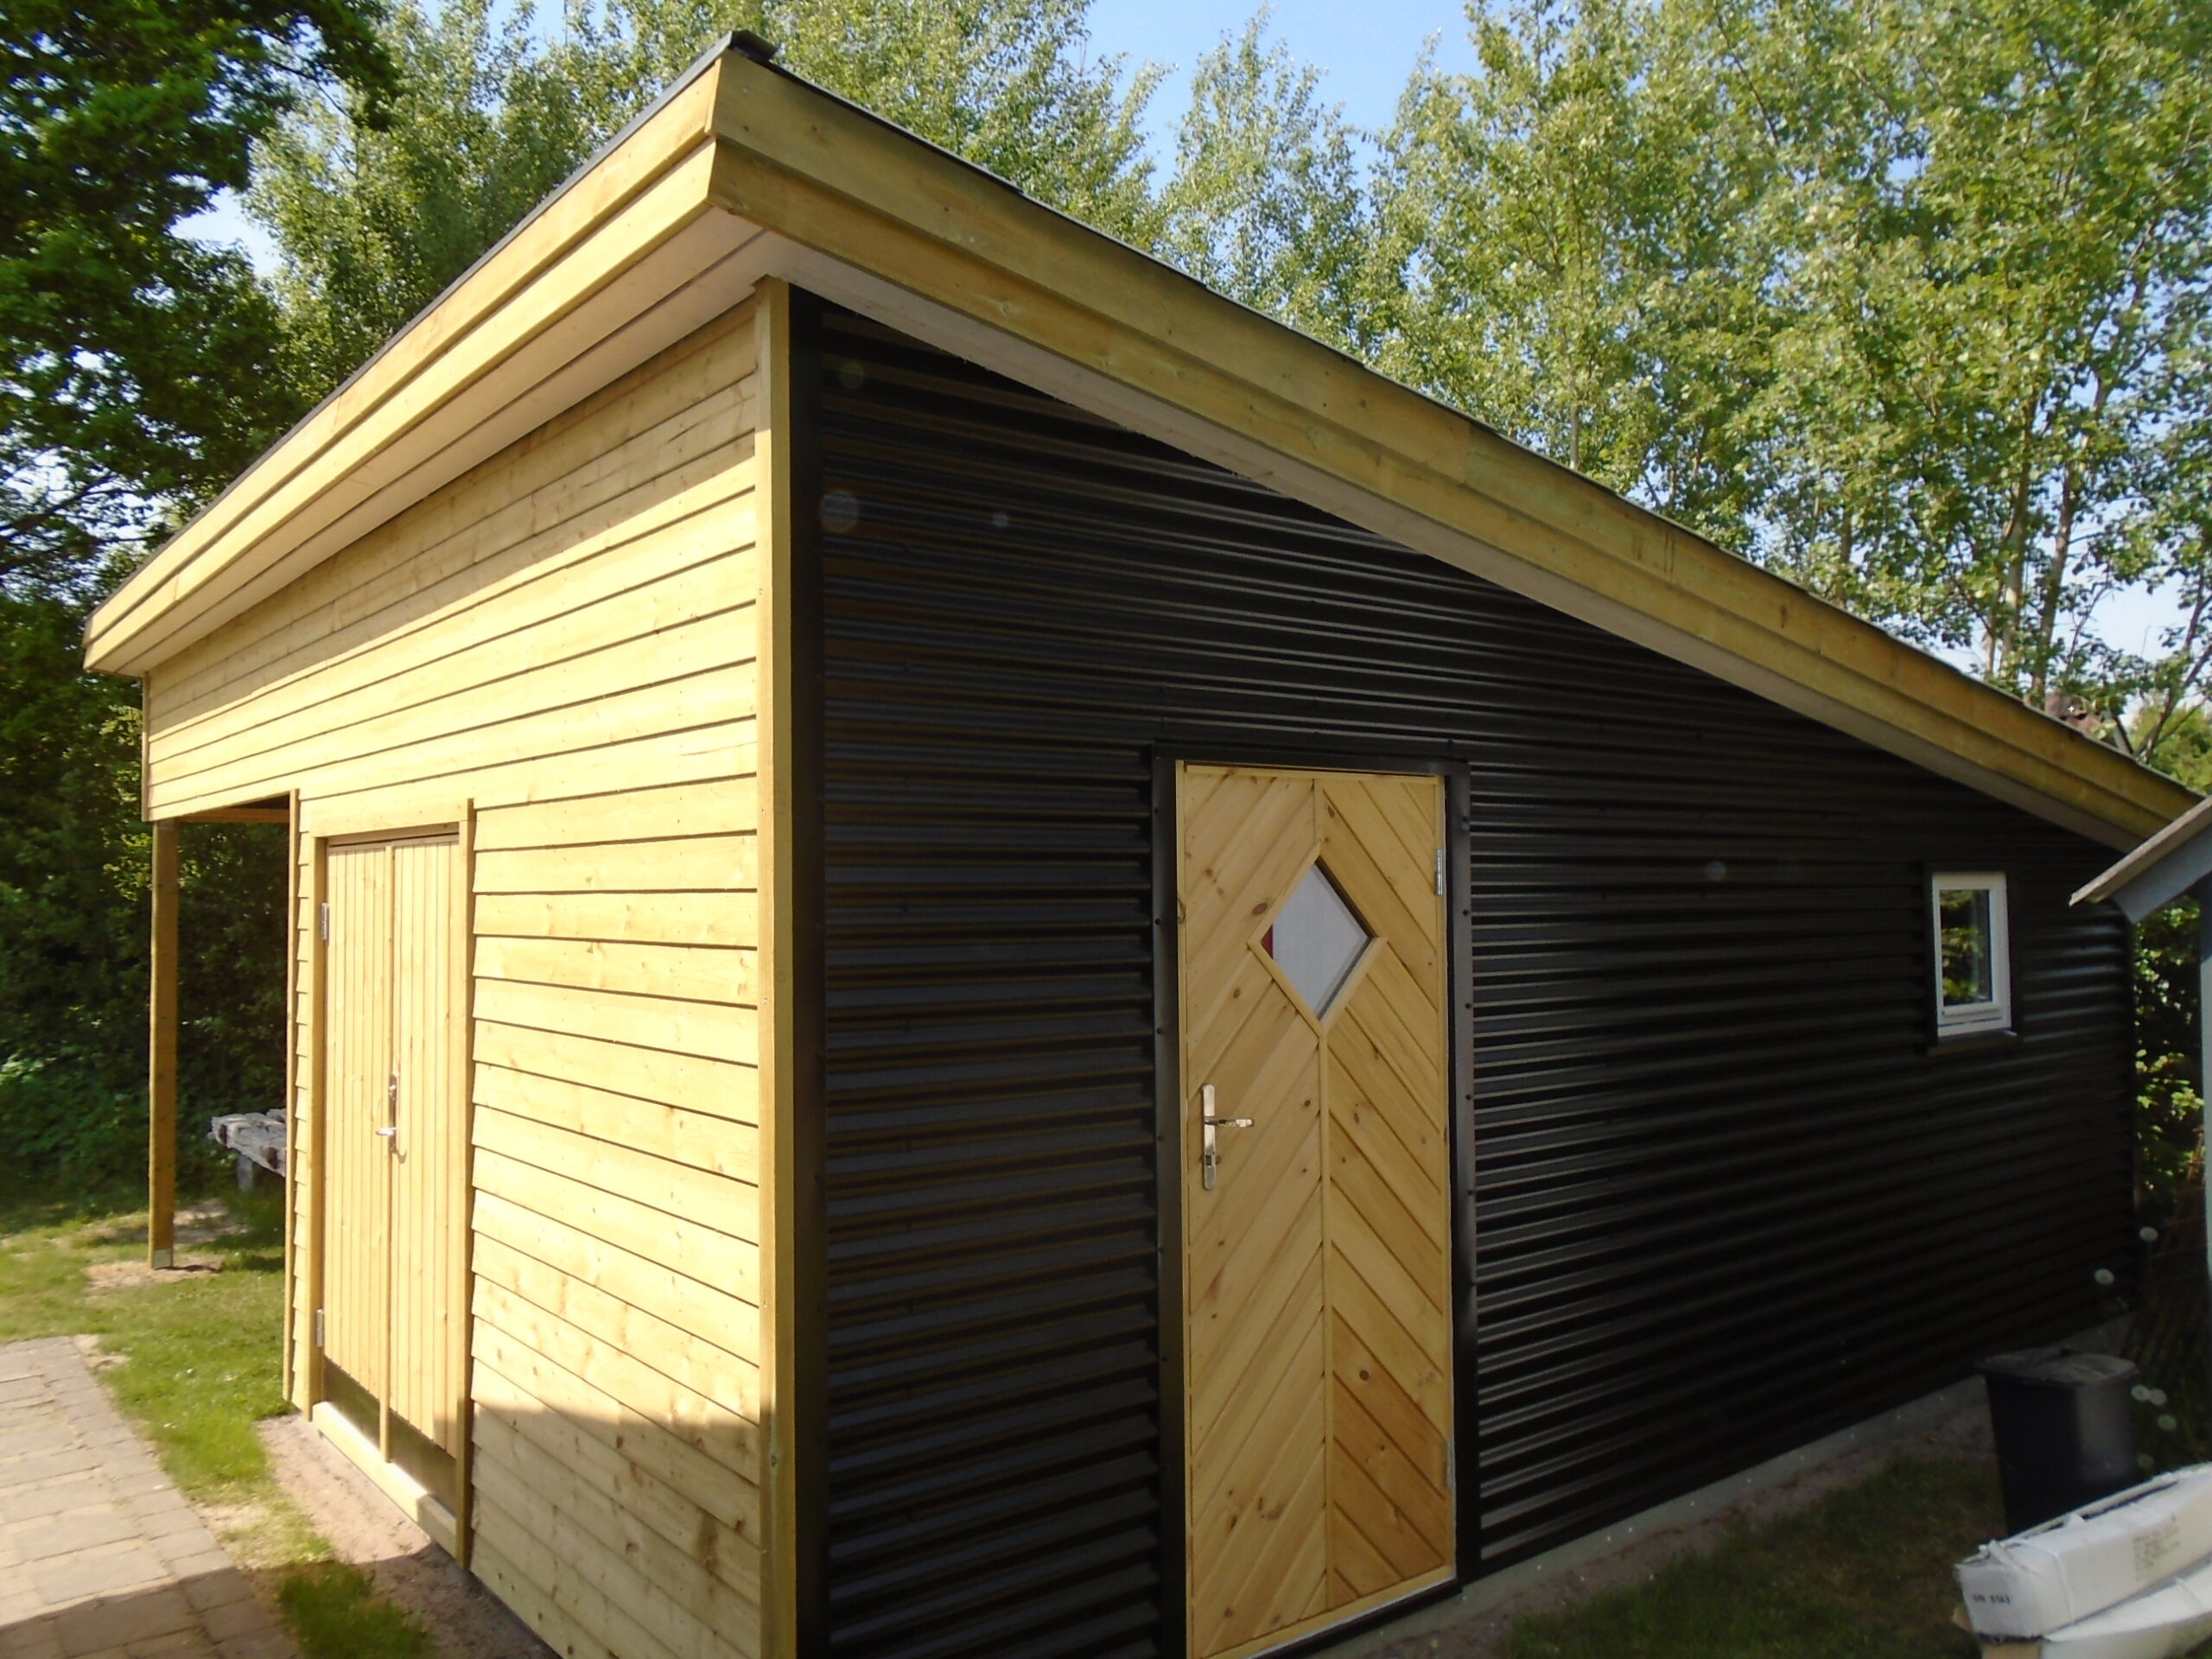 Ungdommelige Carport / udhus | Thymann's Tømrerfirma GL61